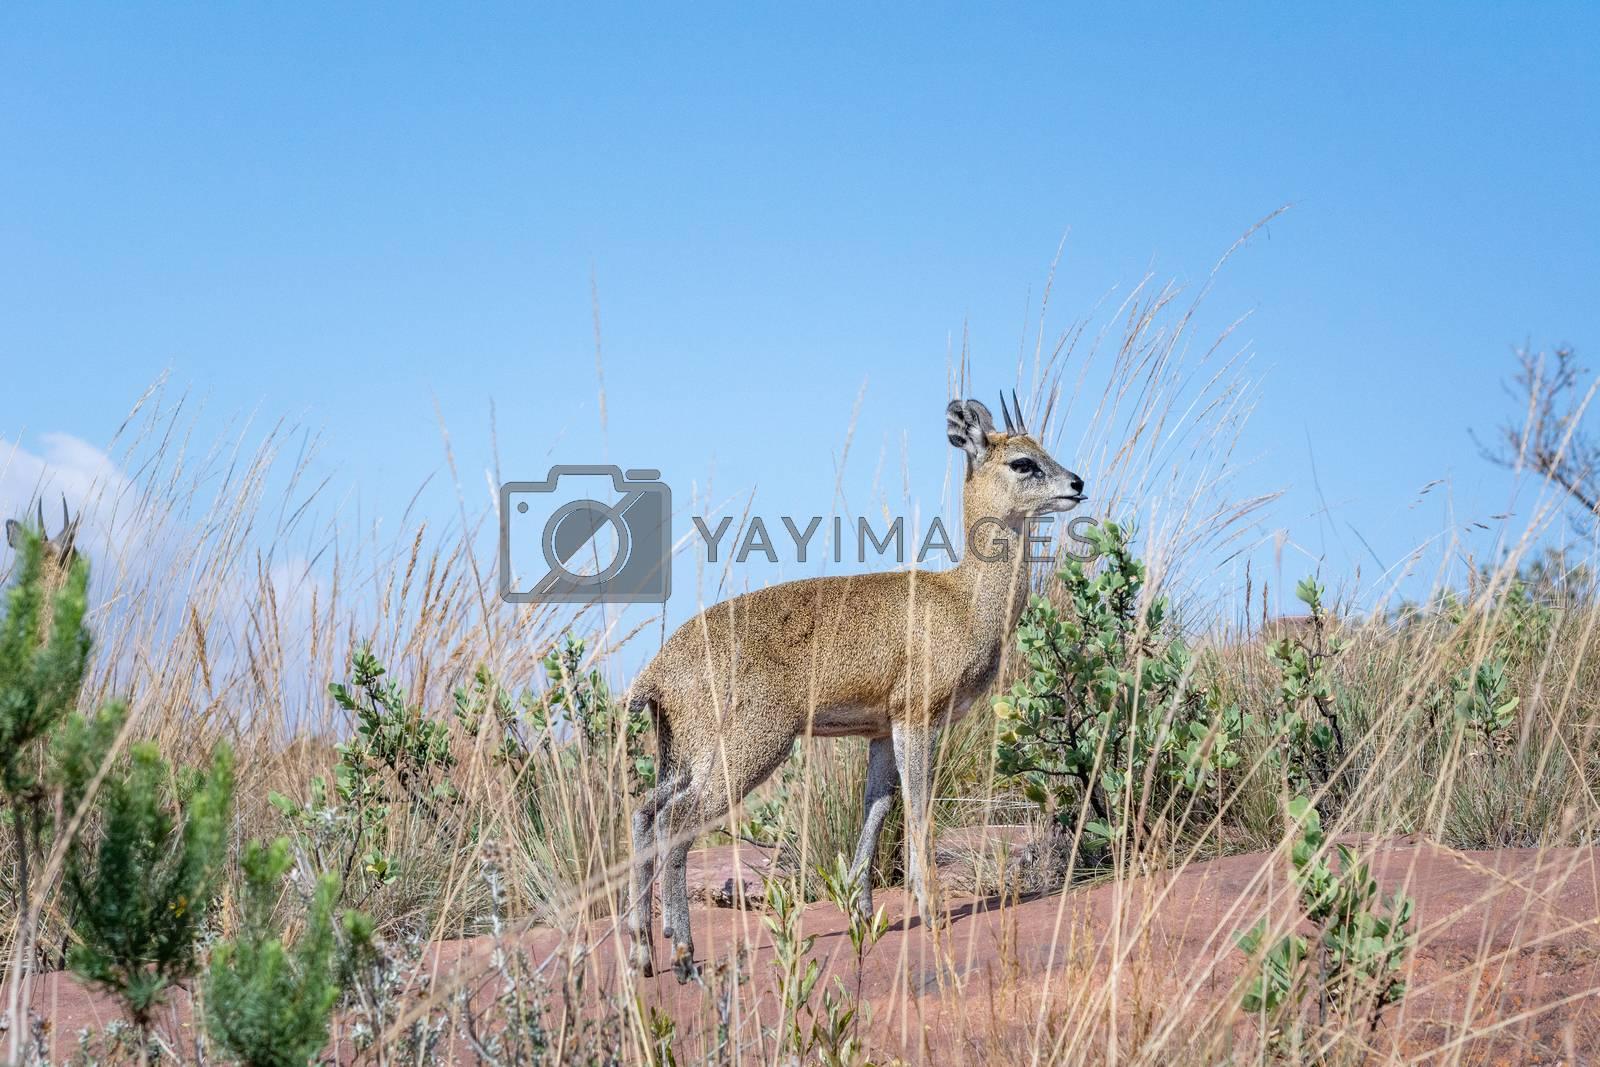 Klipspringer antelope (Oreotragus oreotragus) on blue sky in the background. Plenty of copy space. Animal wildlife